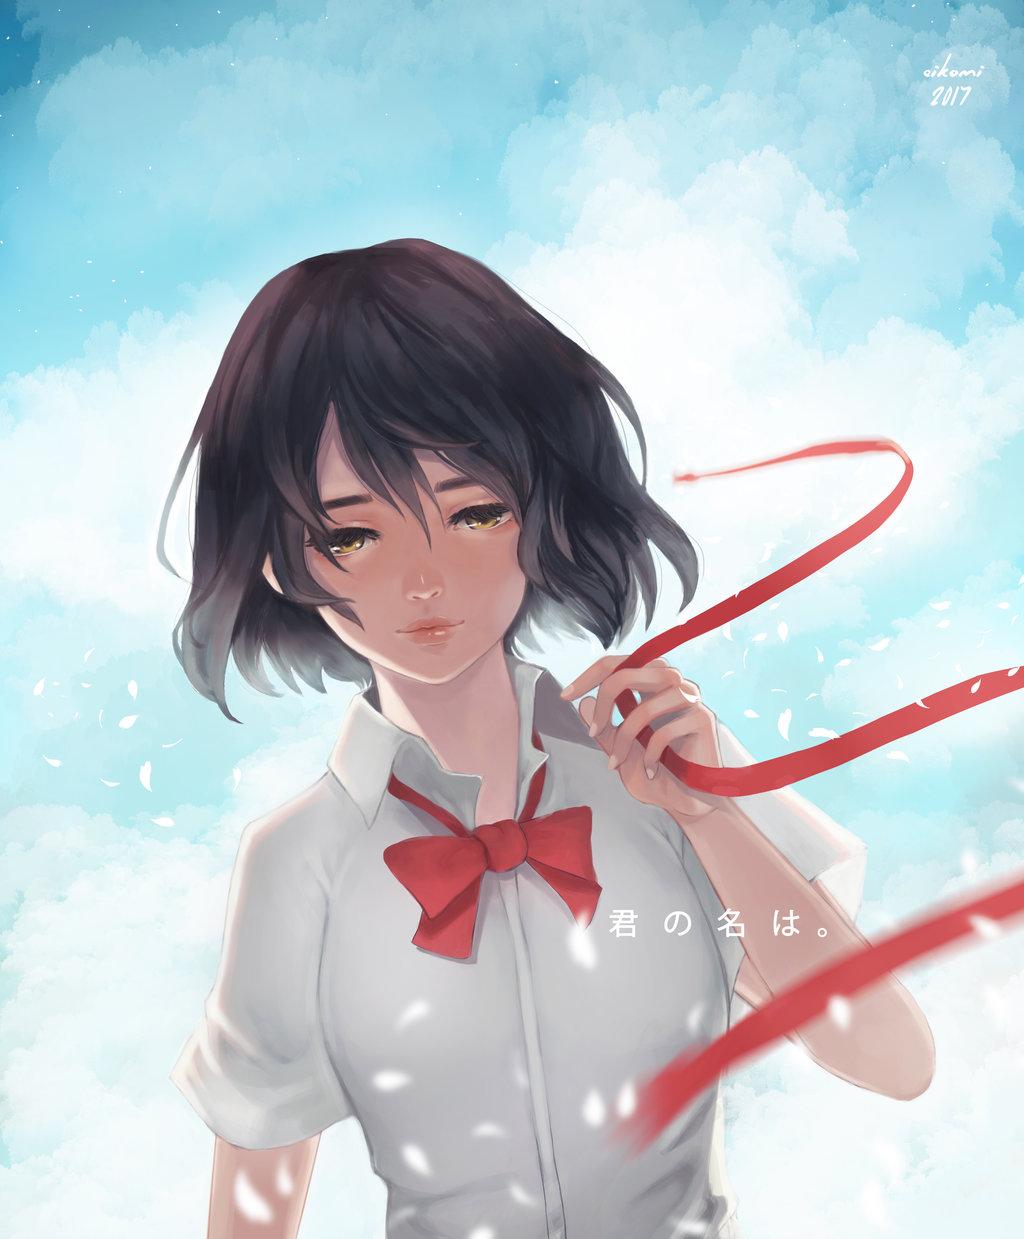 Фото Miyamizu Mitsuha / Миямизу Митсуха из аниме Kimi no Na wa / Твое имя, by Eikomi